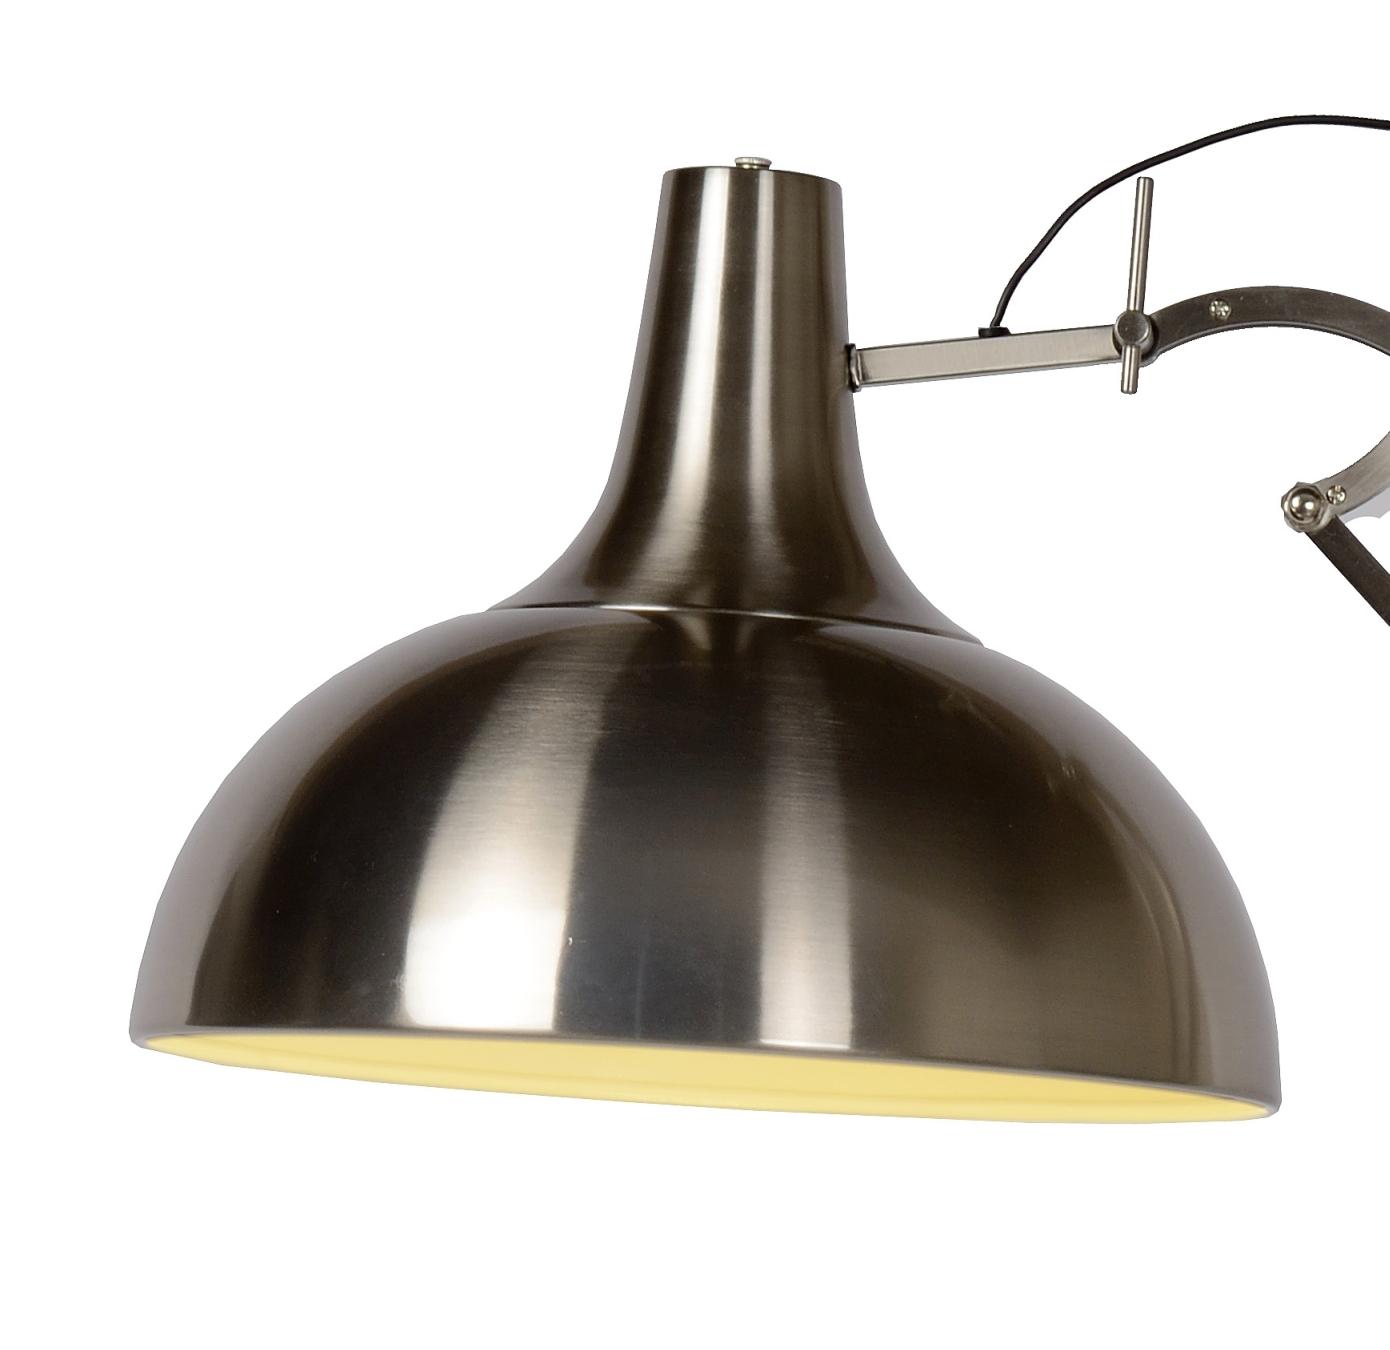 Lucide Verstelbare Vloerlamp Watsie - H168 Cm - Mat RVS Chroom